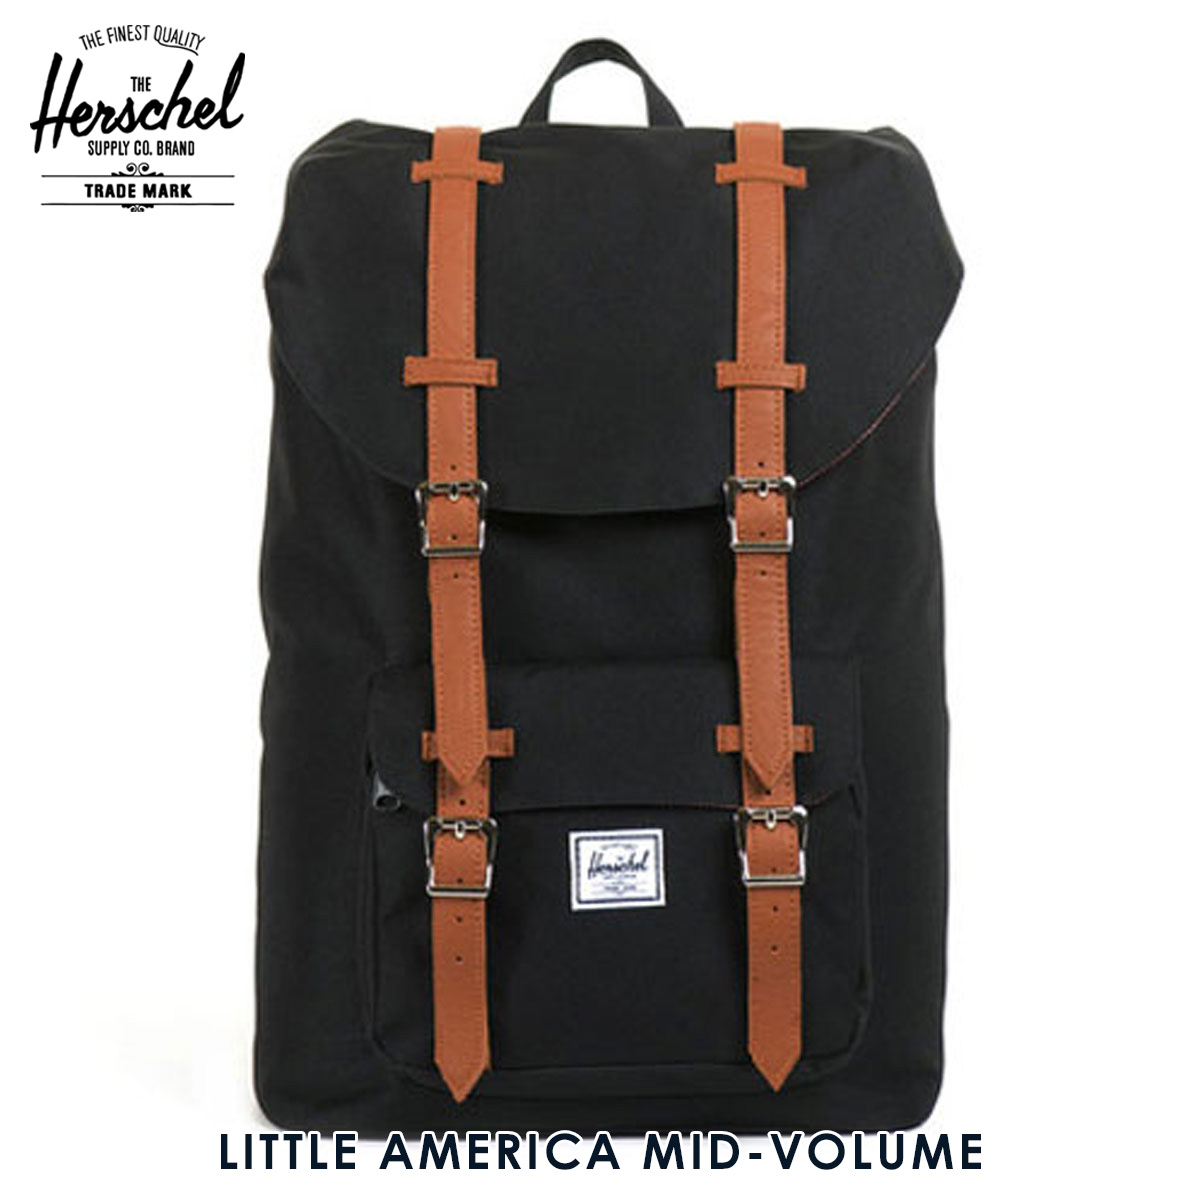 15%OFFセール 【販売期間 9/4 20:00~9/11 01:59】  ハーシェル バッグ 正規販売店 Herschel Supply ハーシャルサプライ バッグ Little America Mid-Volume Classics Mid Backpacks 10020-00001-OS Black D15S25